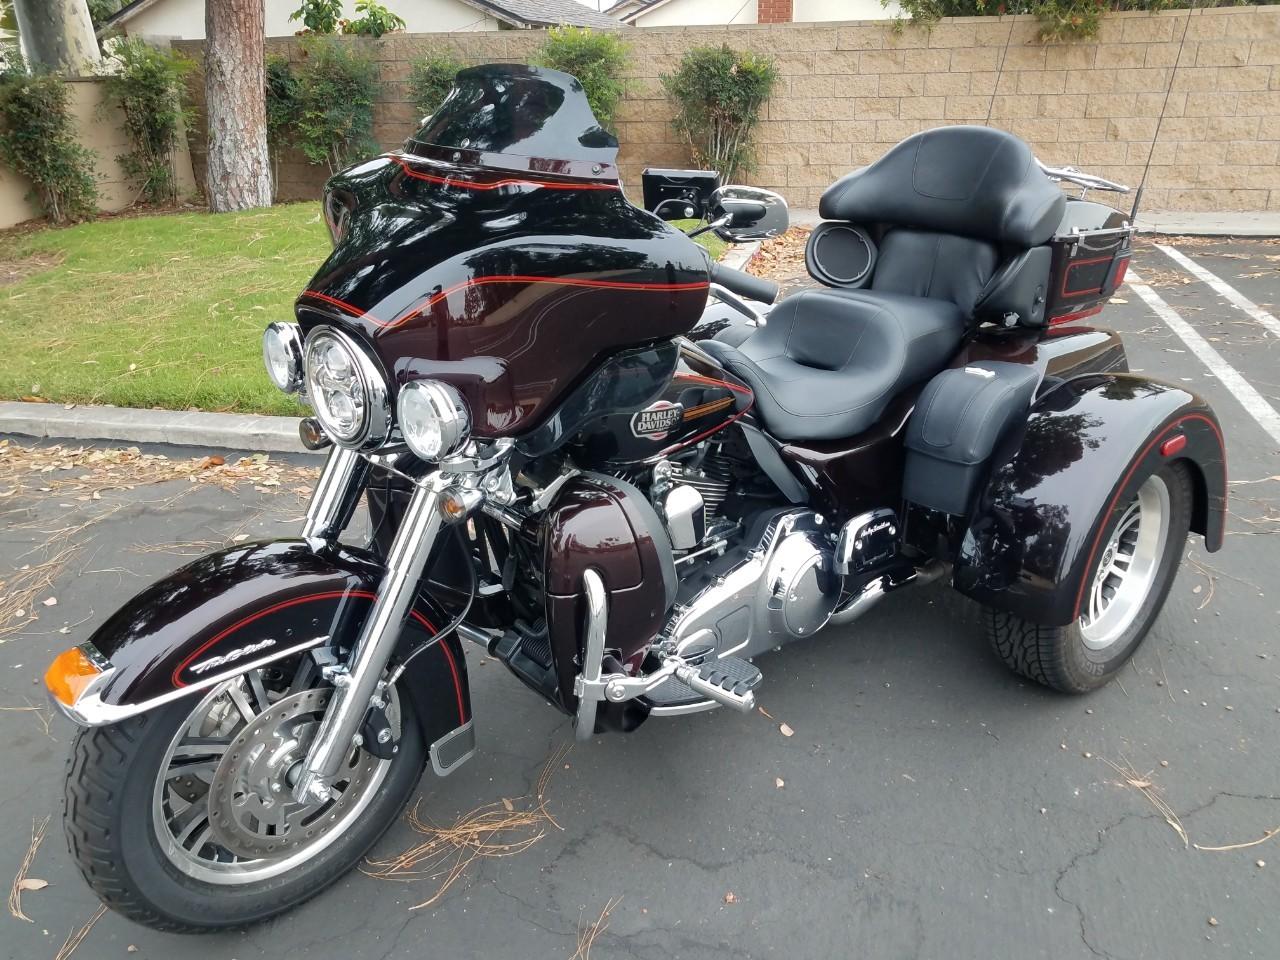 63 Harley Davidson Tri Glide Snowmobile Trader 2014 Trailer Wiring Harness